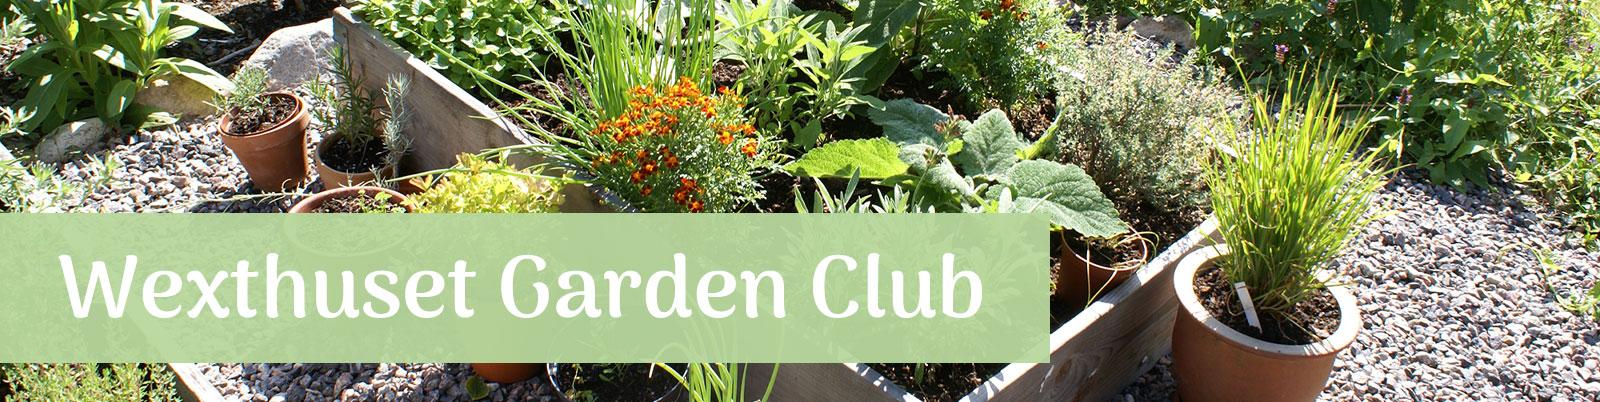 Wexthuset Garden Club